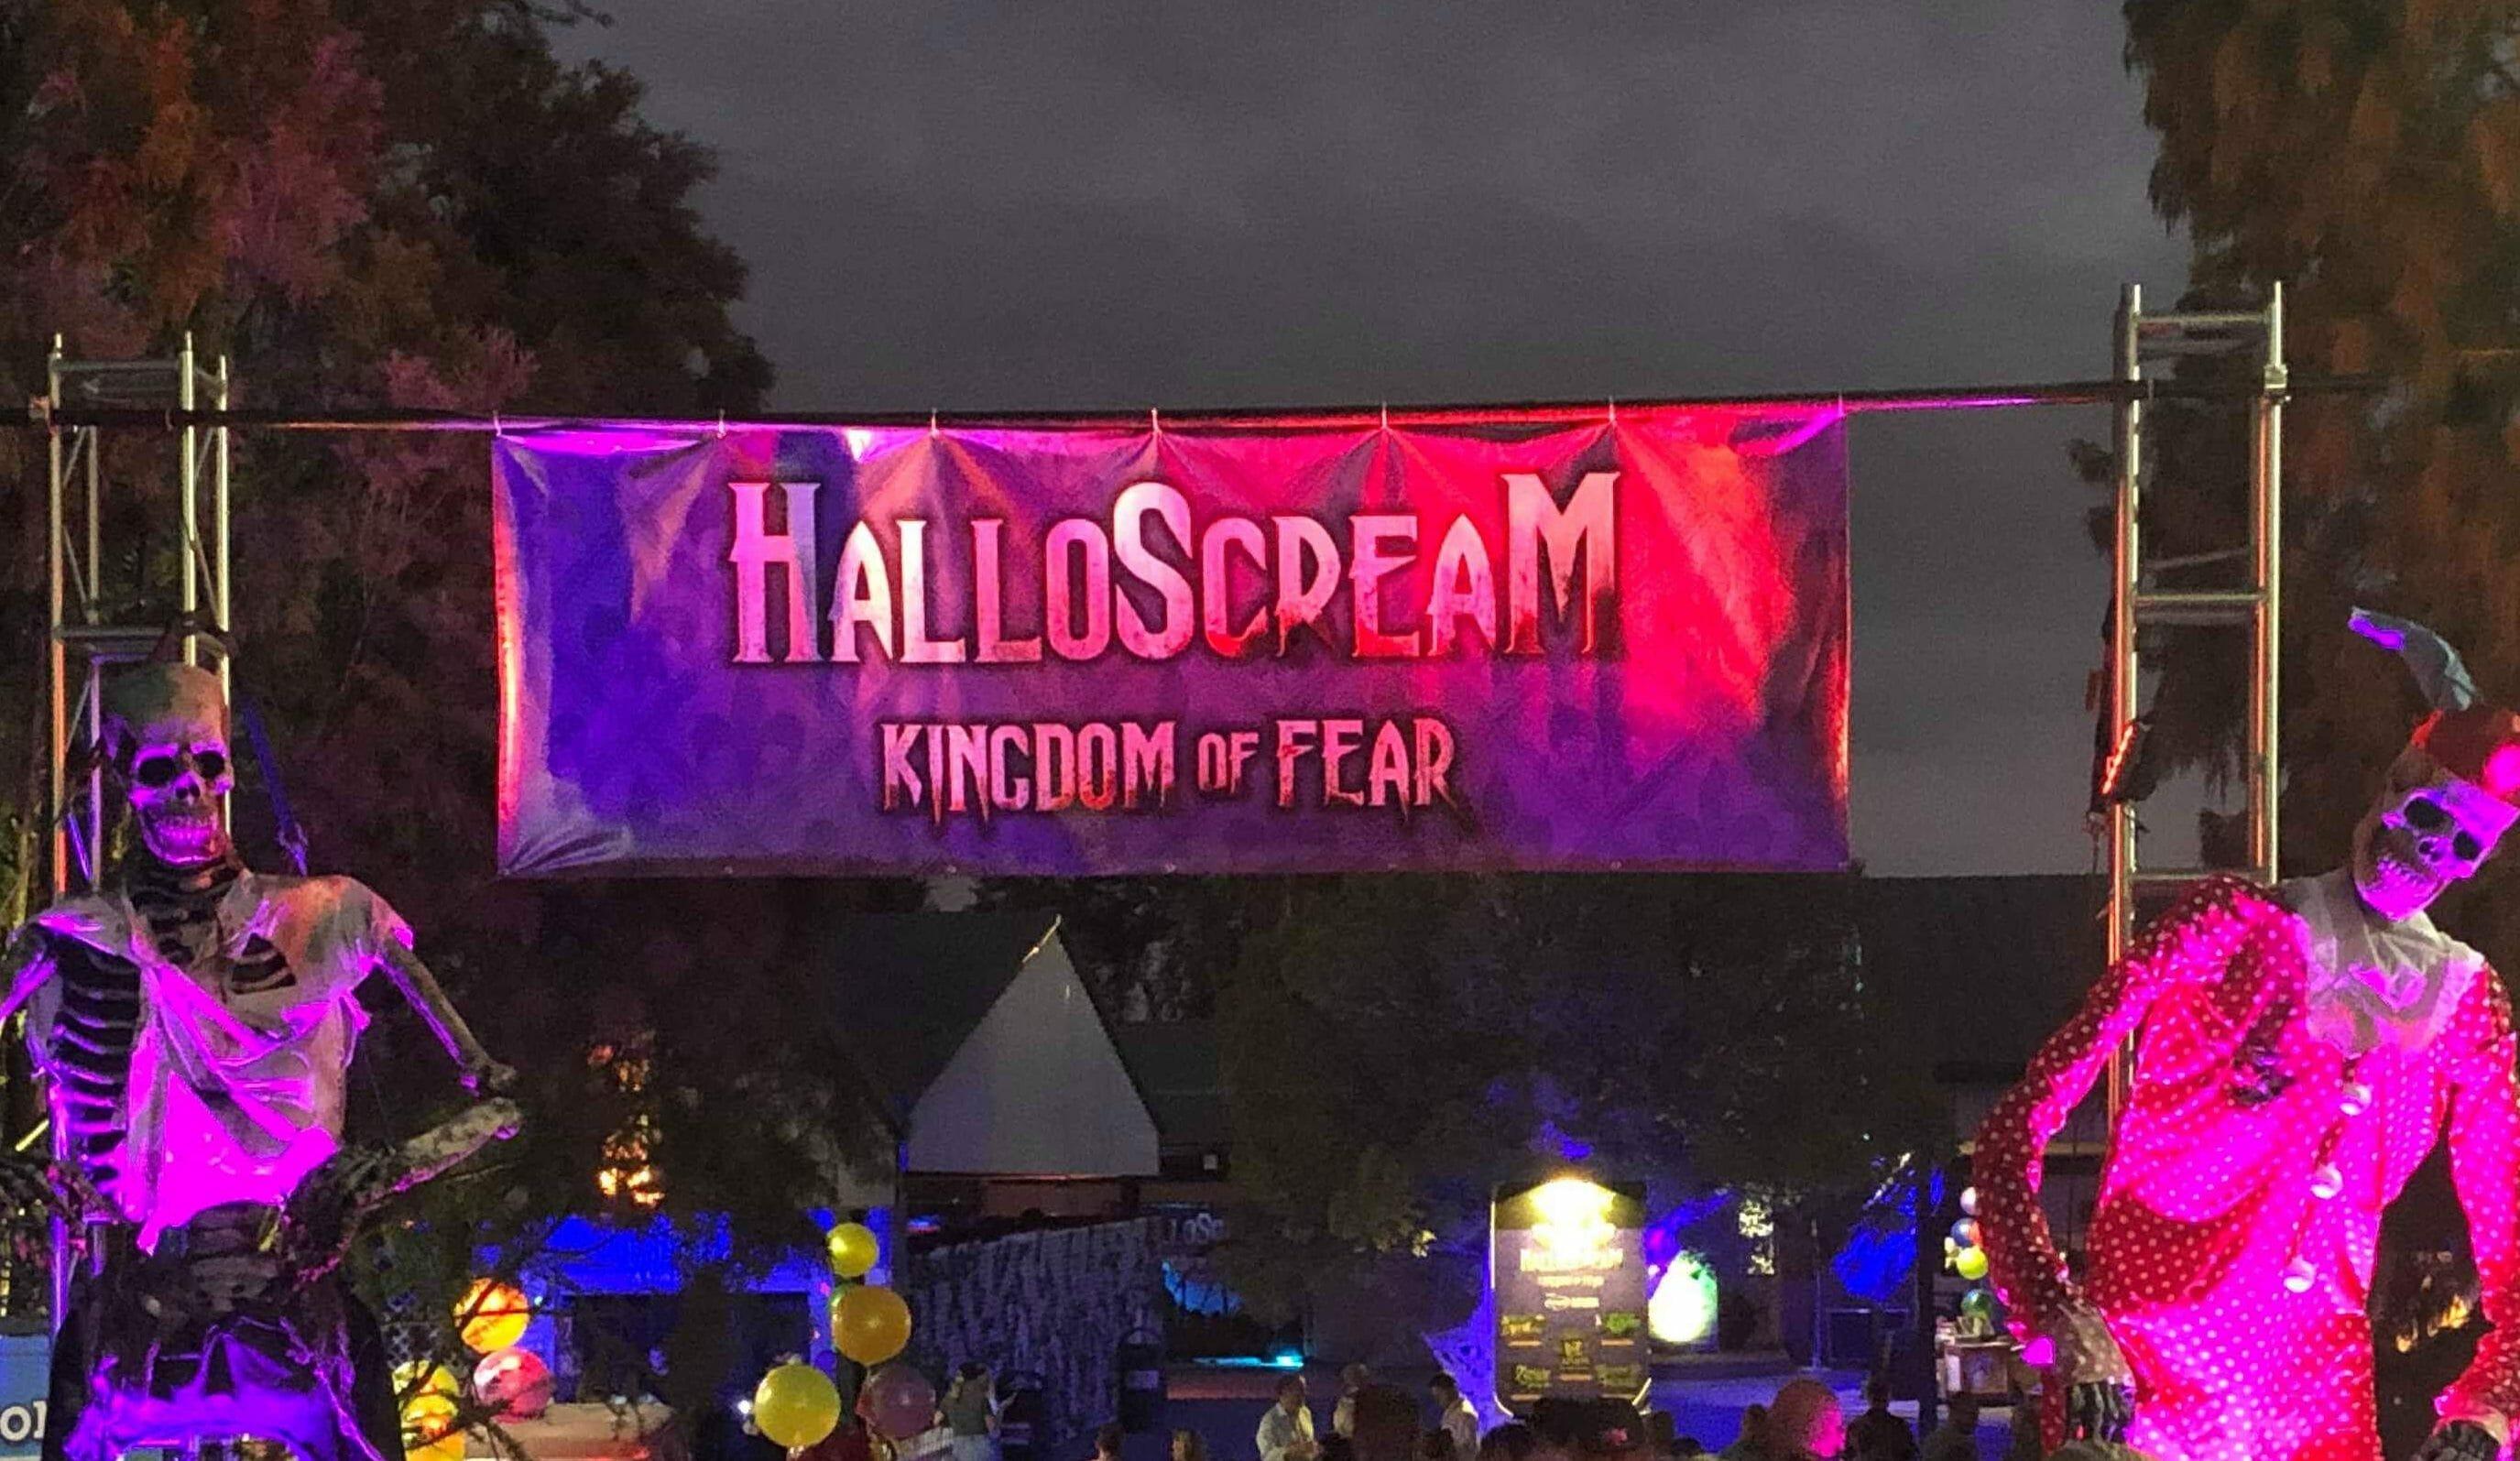 Kentucky Kingdom Introduces New HalloScream Halloween Event